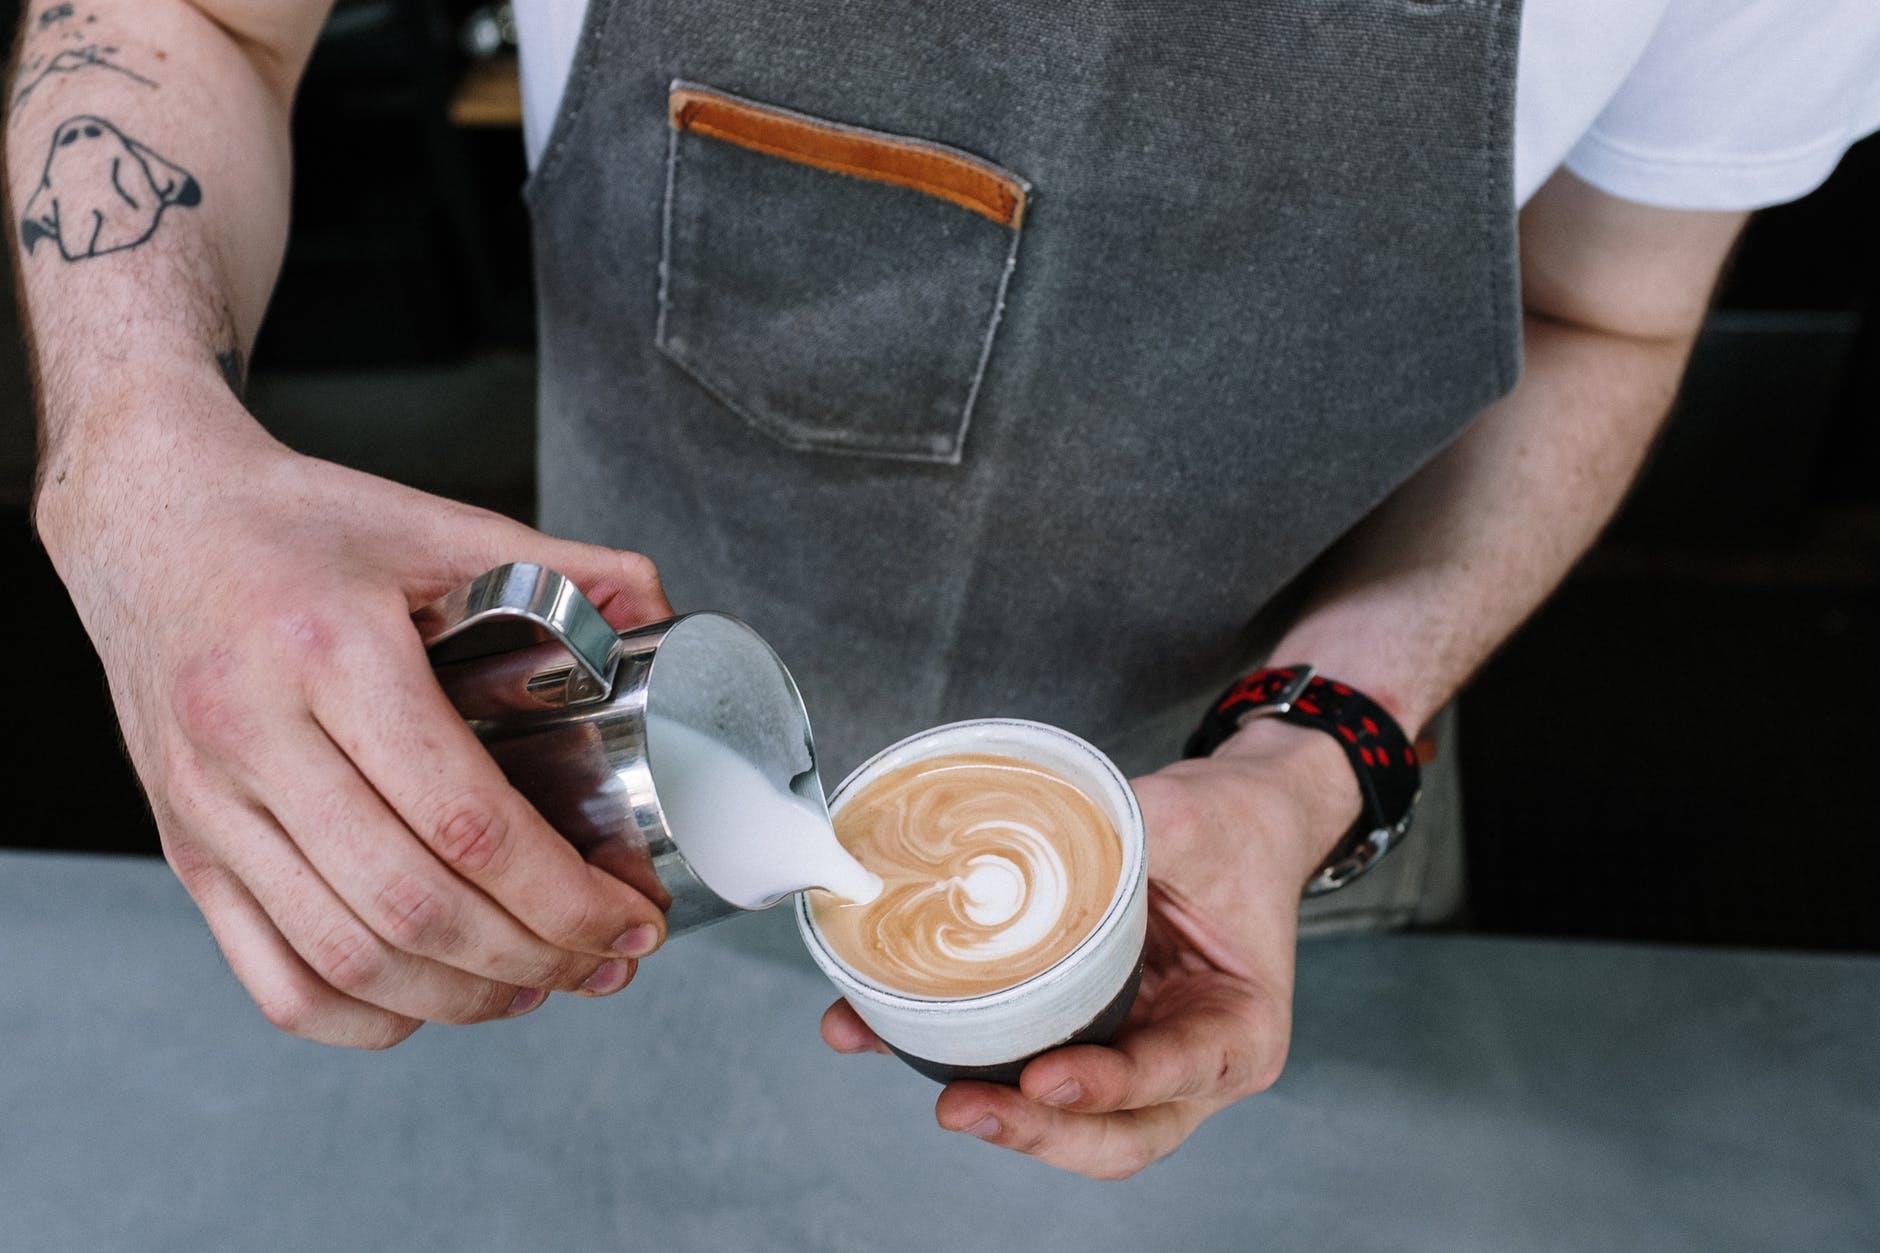 hoeveel koffie drinken we in Nederland gemiddeld per dag